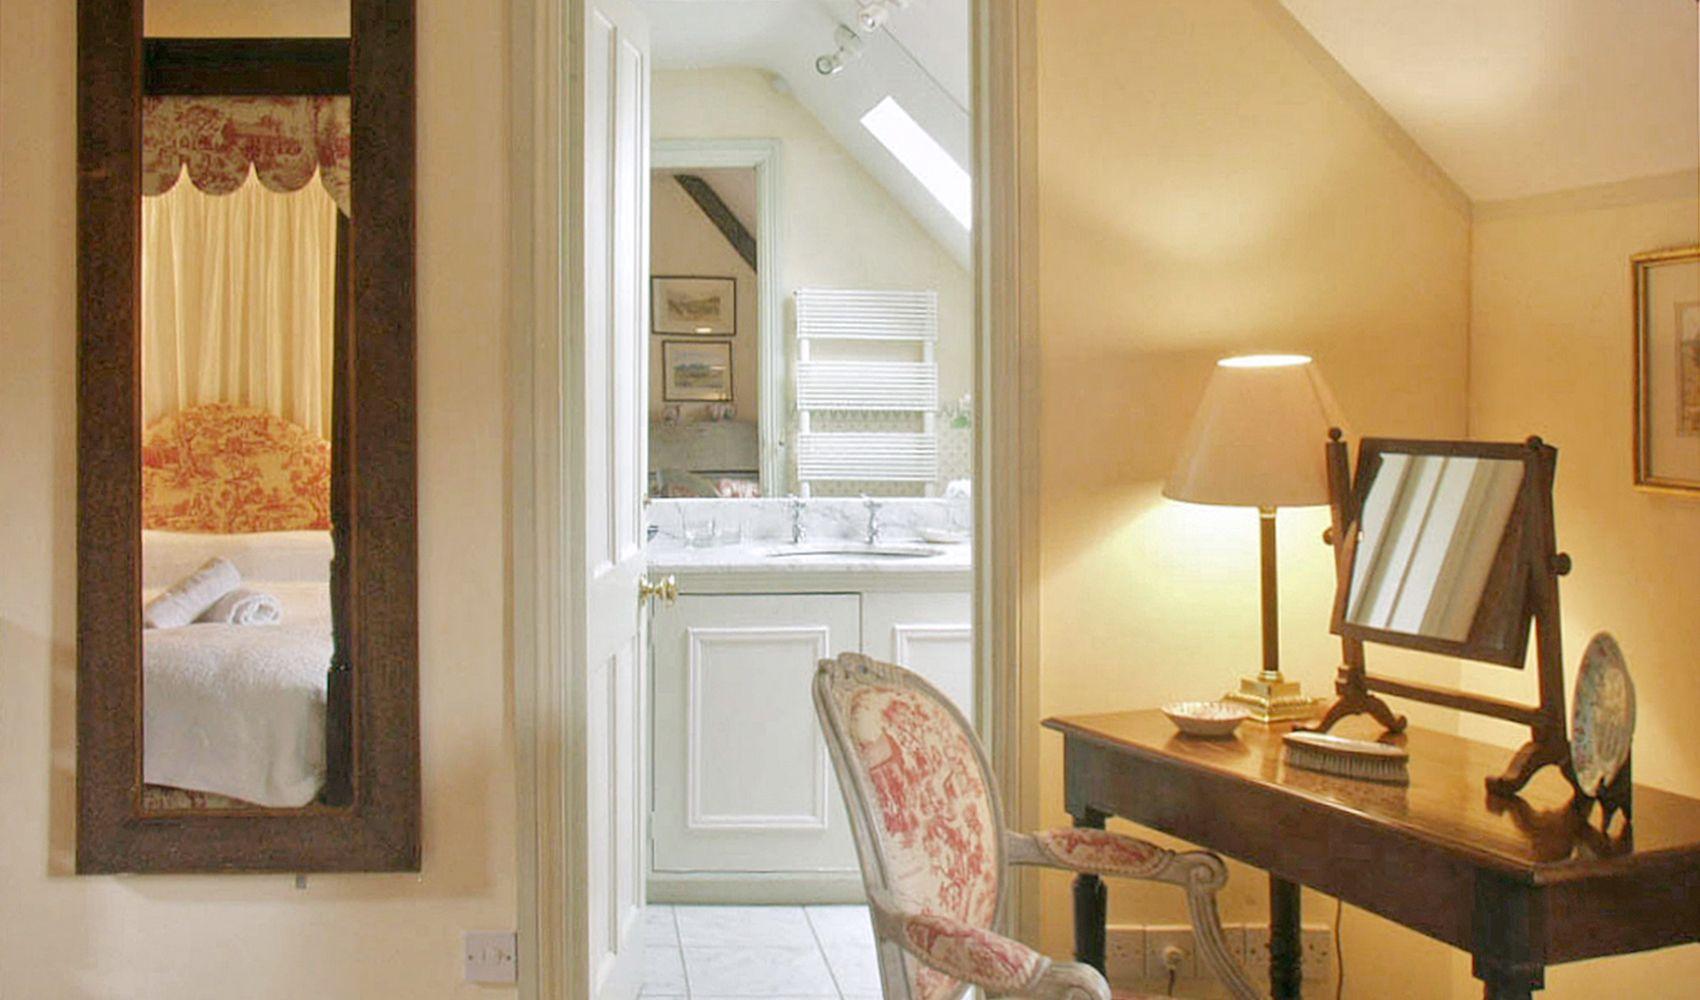 First floor: Master bedroom with large en suite bathroom